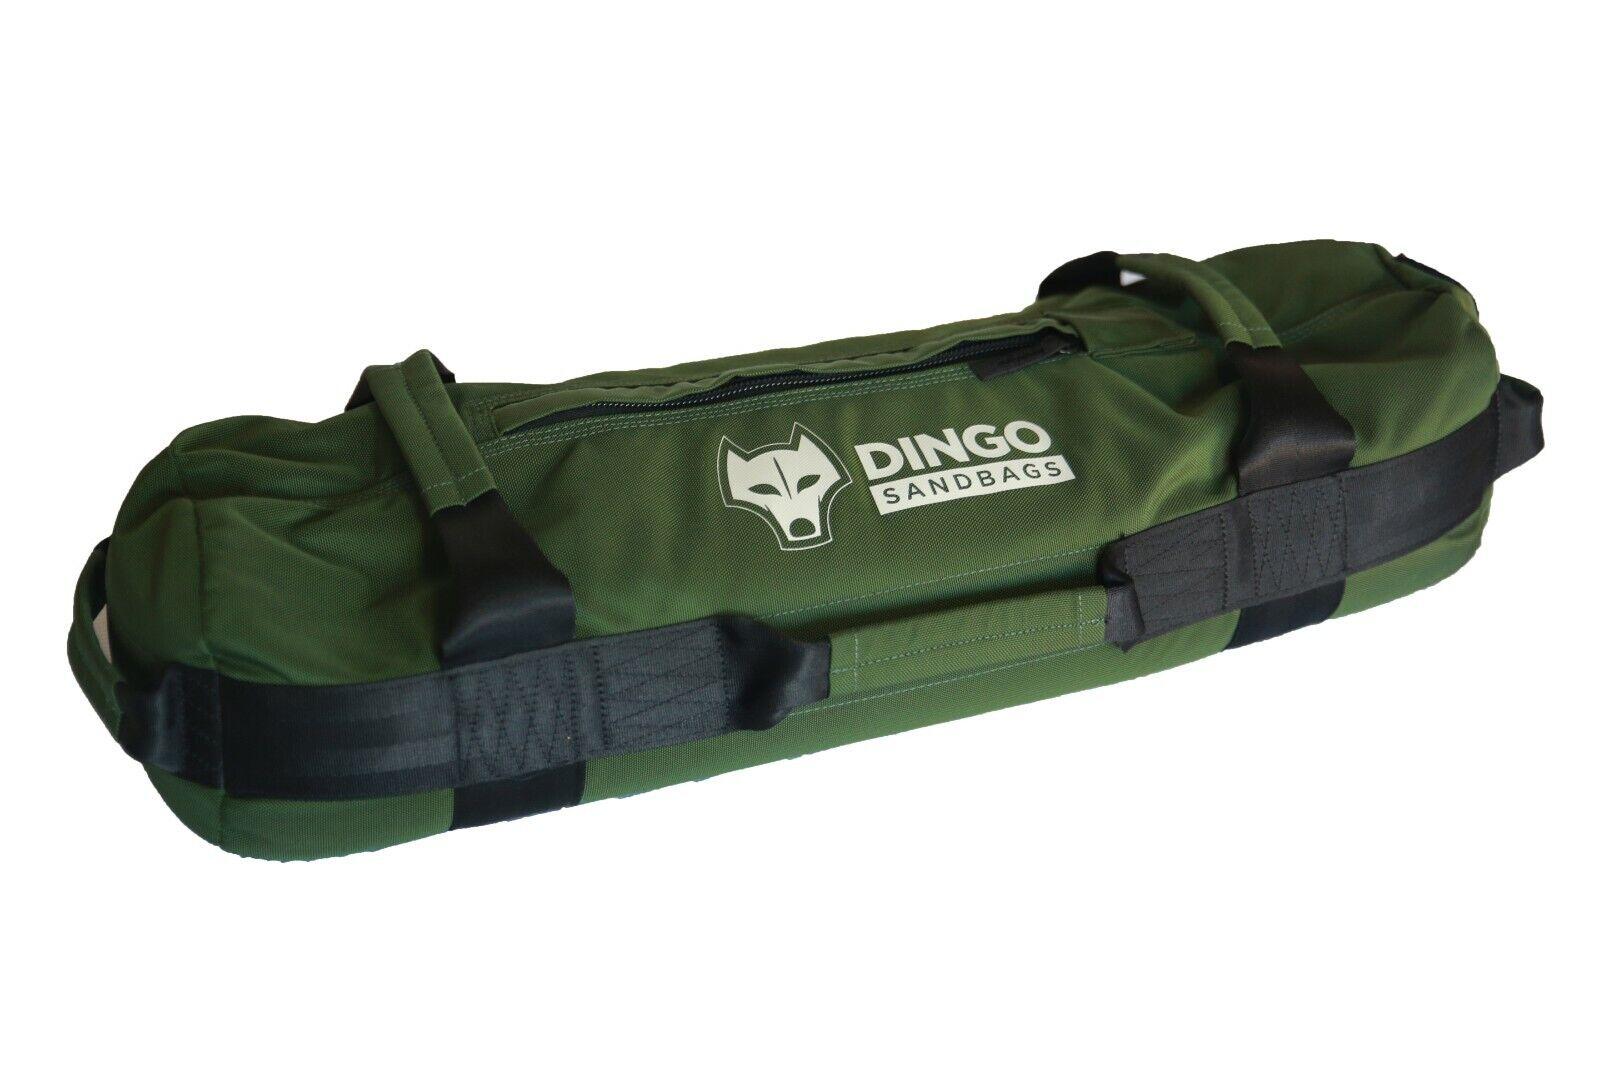 Dingo Sandsäcke - Medium 15kg